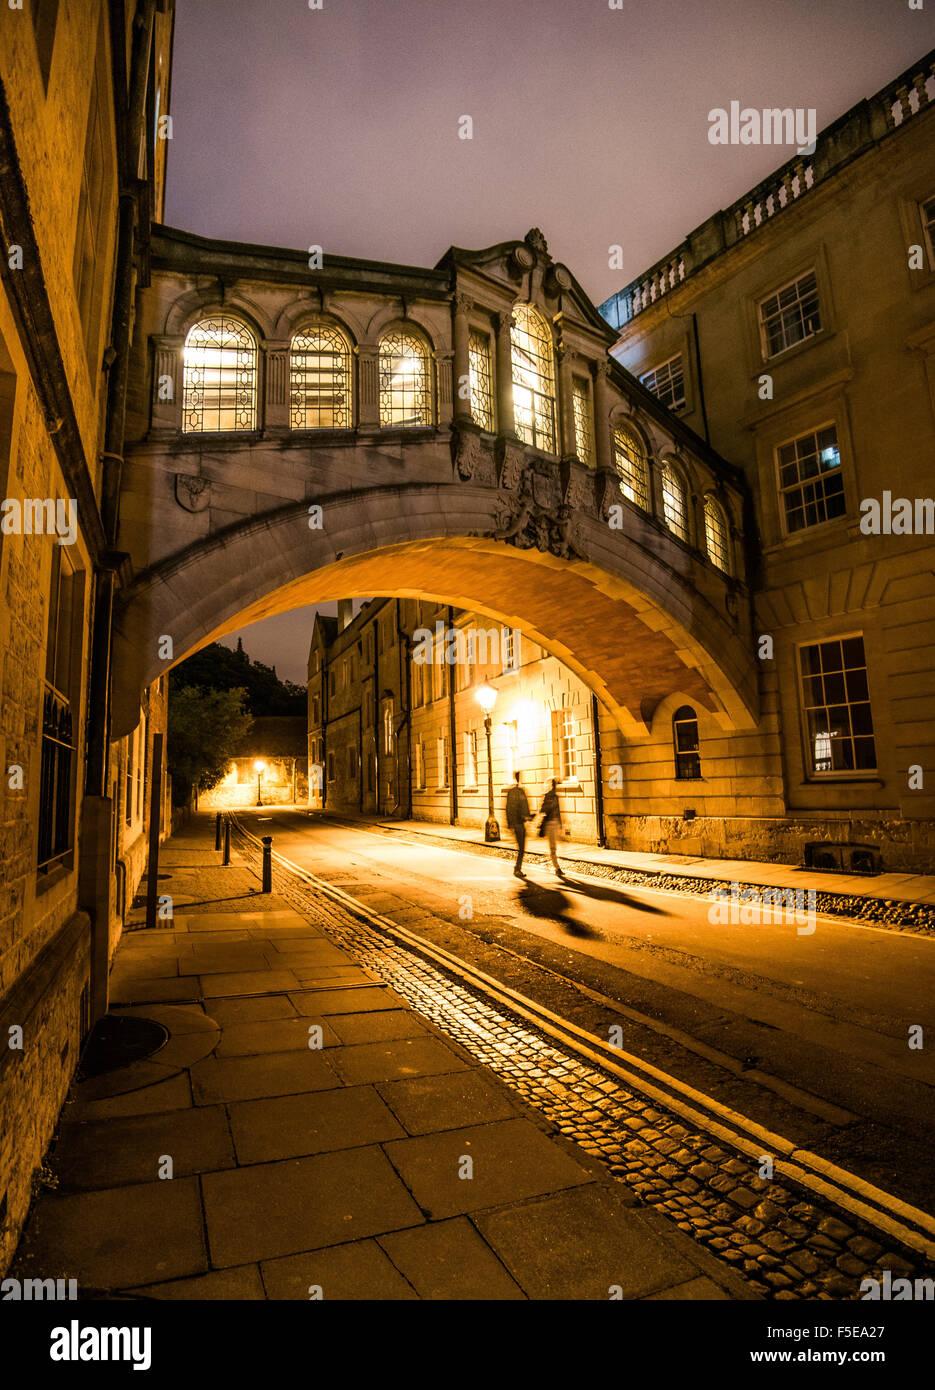 Seufzerbrücke, Oxford, Oxfordshire, England, Vereinigtes Königreich, Europa Stockbild